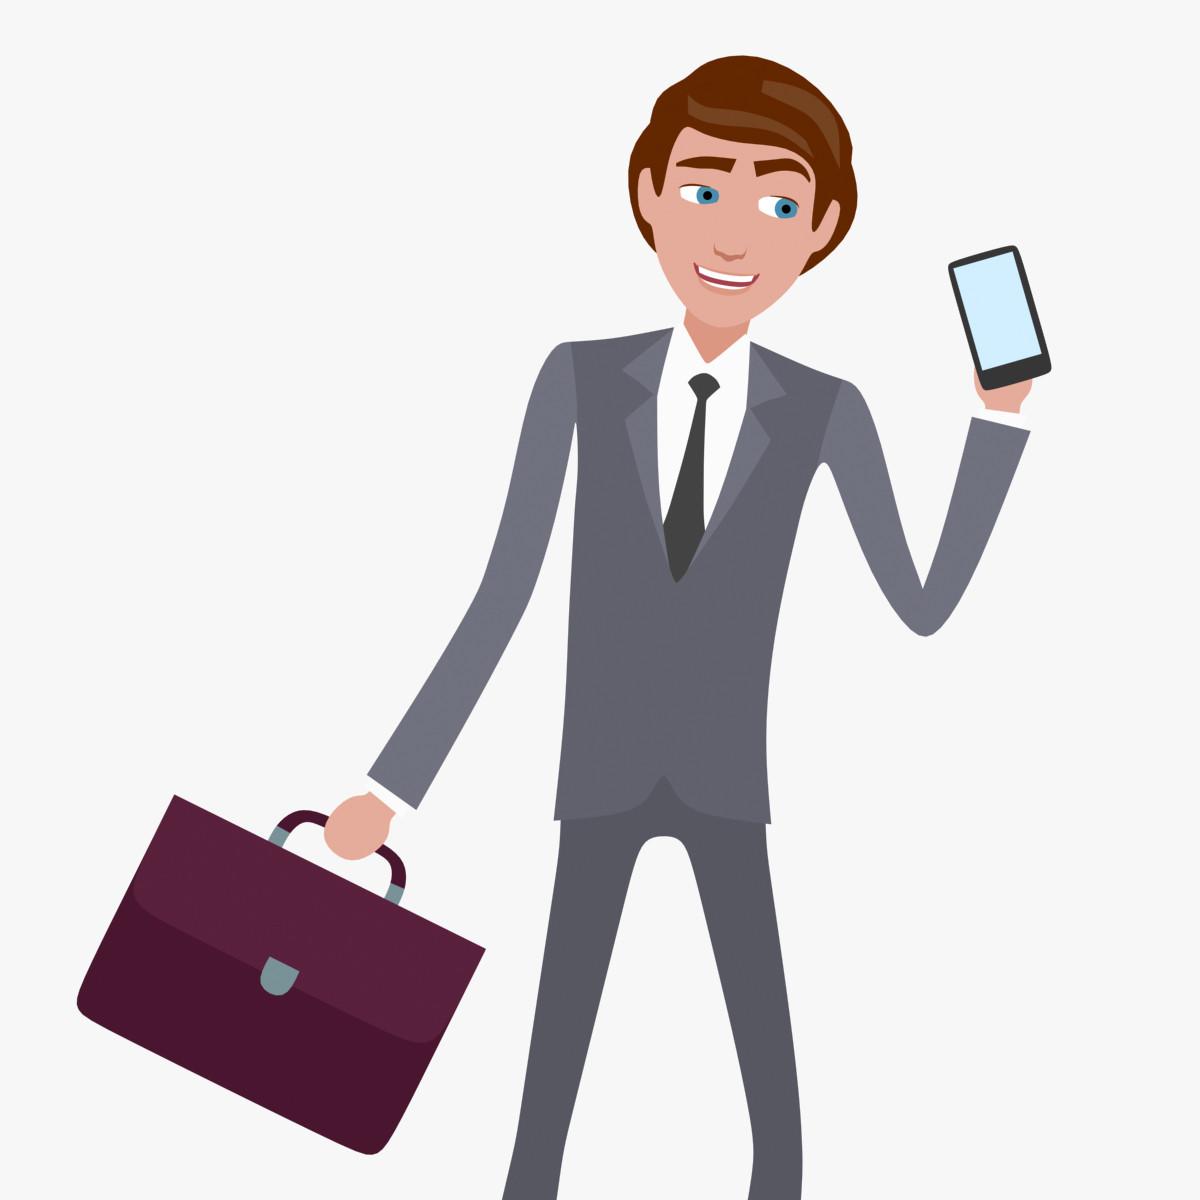 Max Rigged Cartoon 2d Business Man